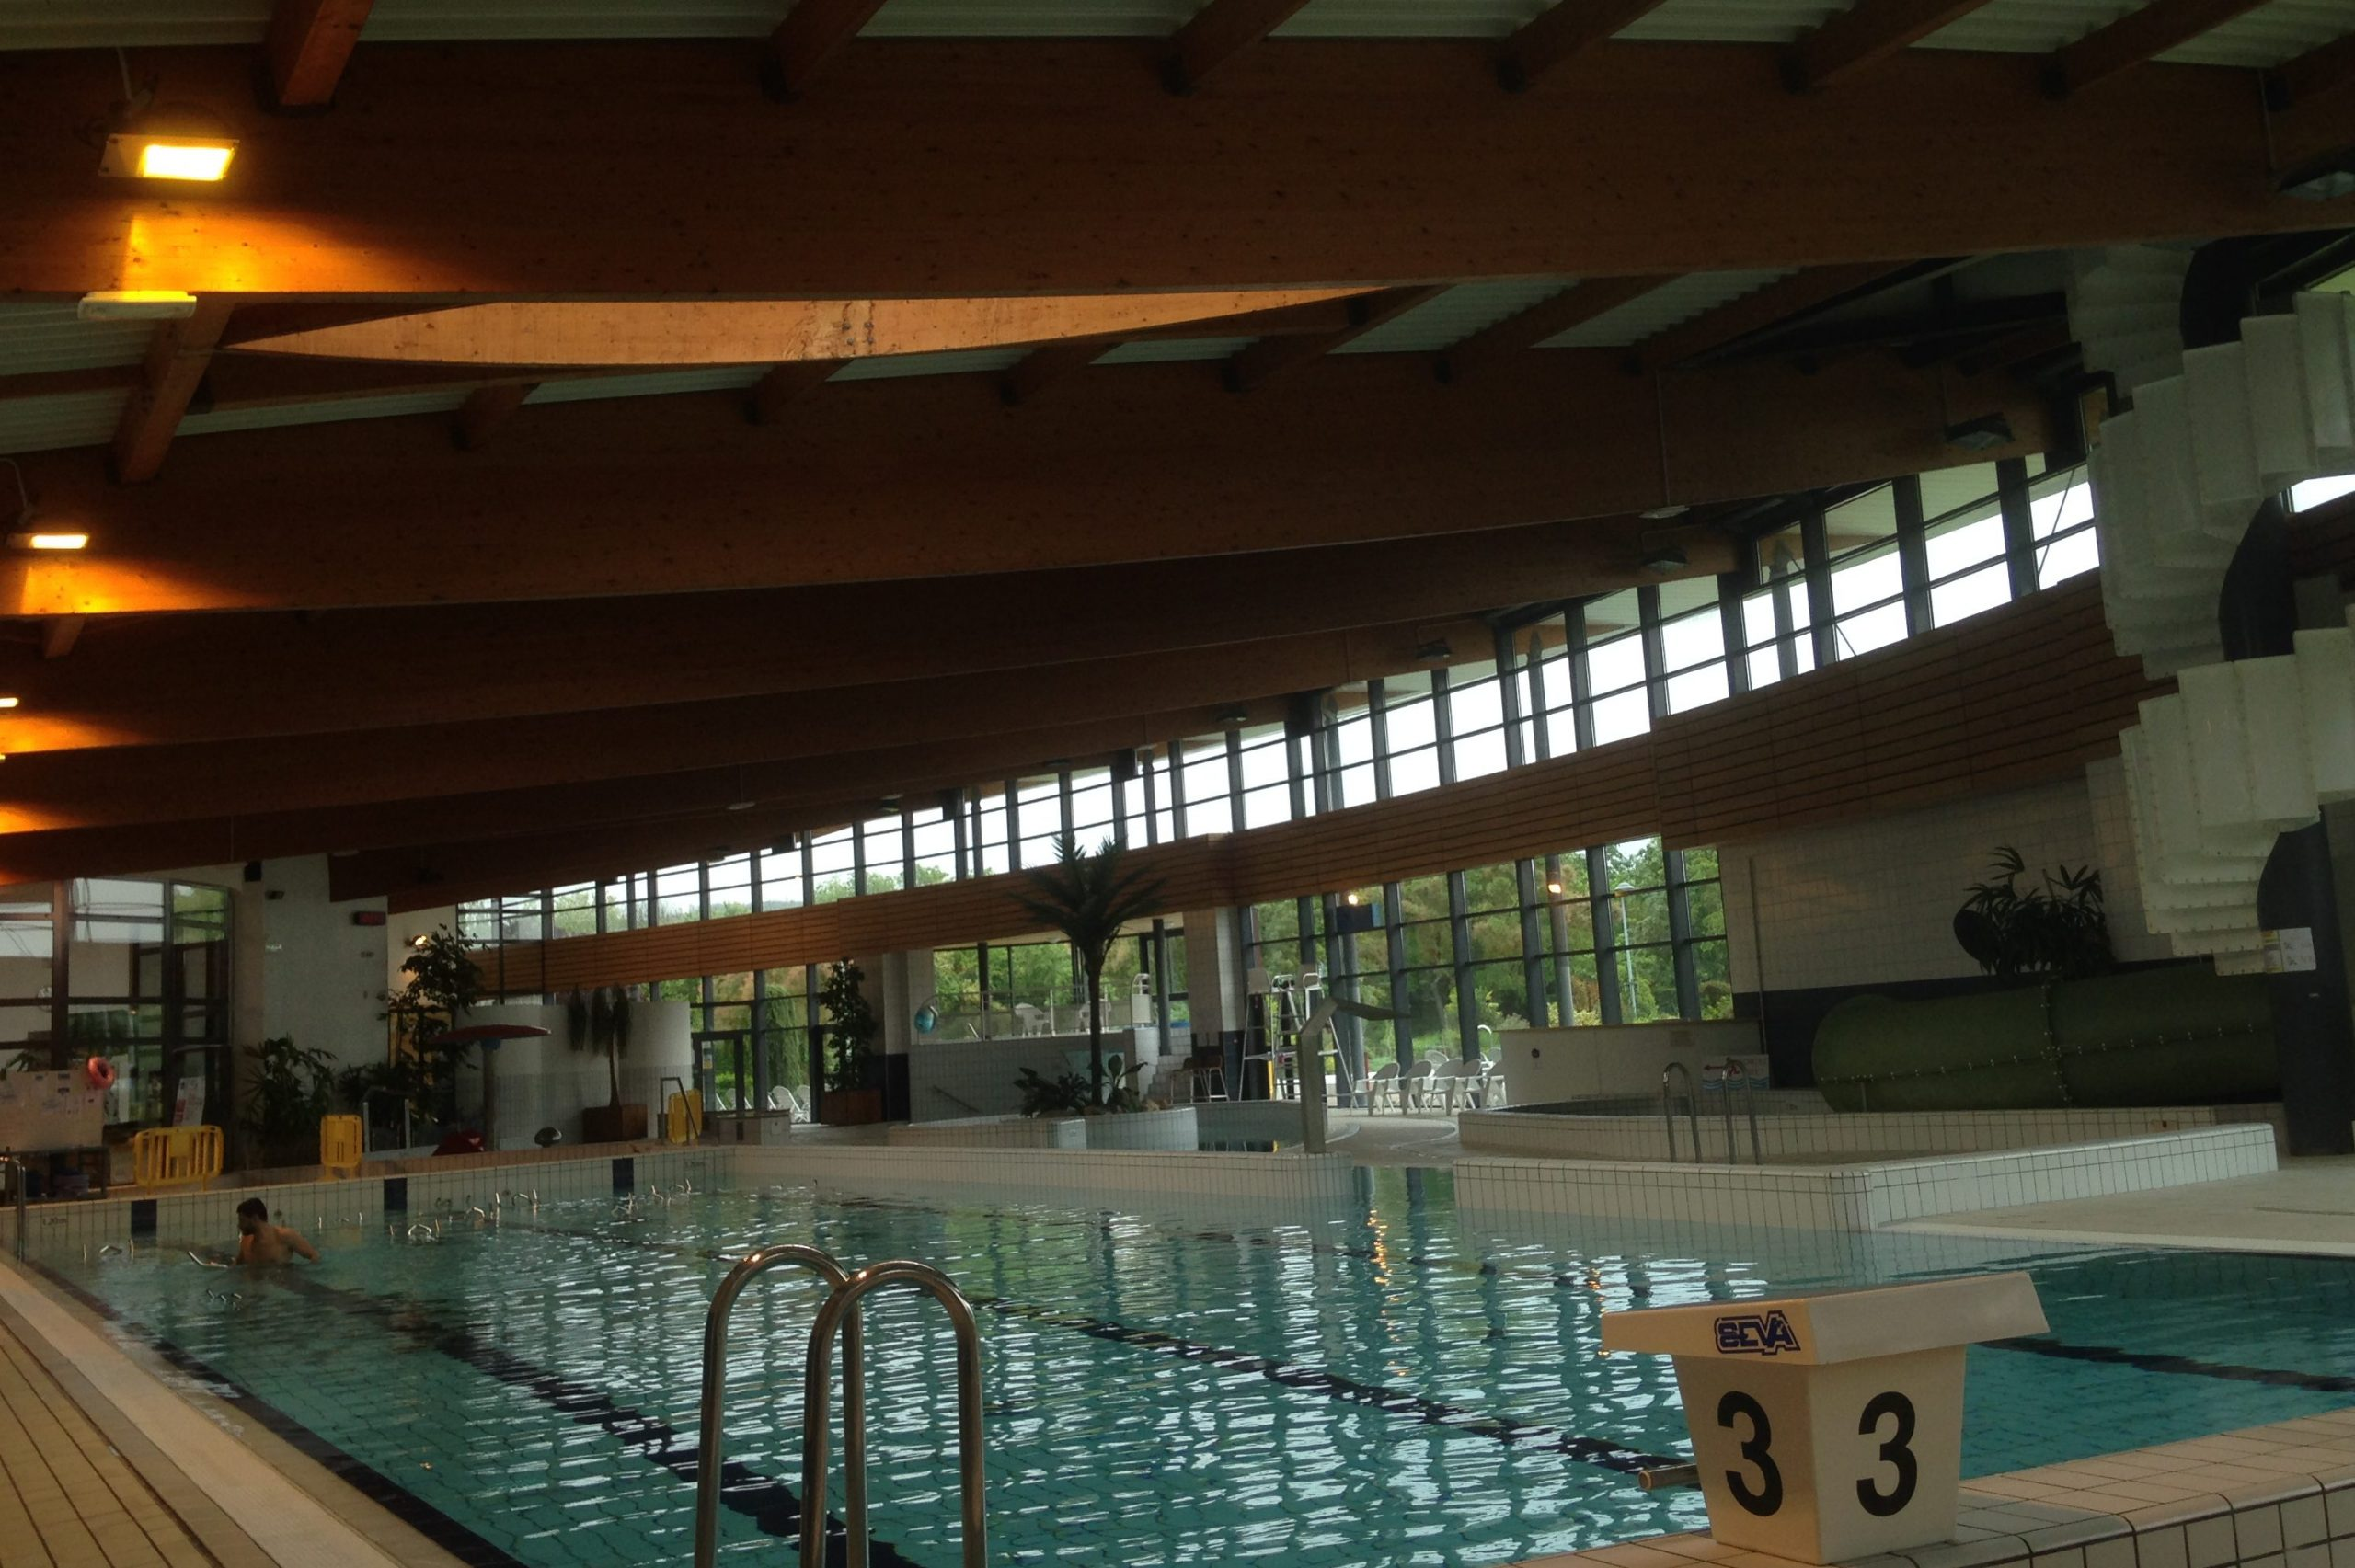 Arbonis | Saint Vulbas (01) – Piscine Sports Loisirs tout Piscine St Vulbas